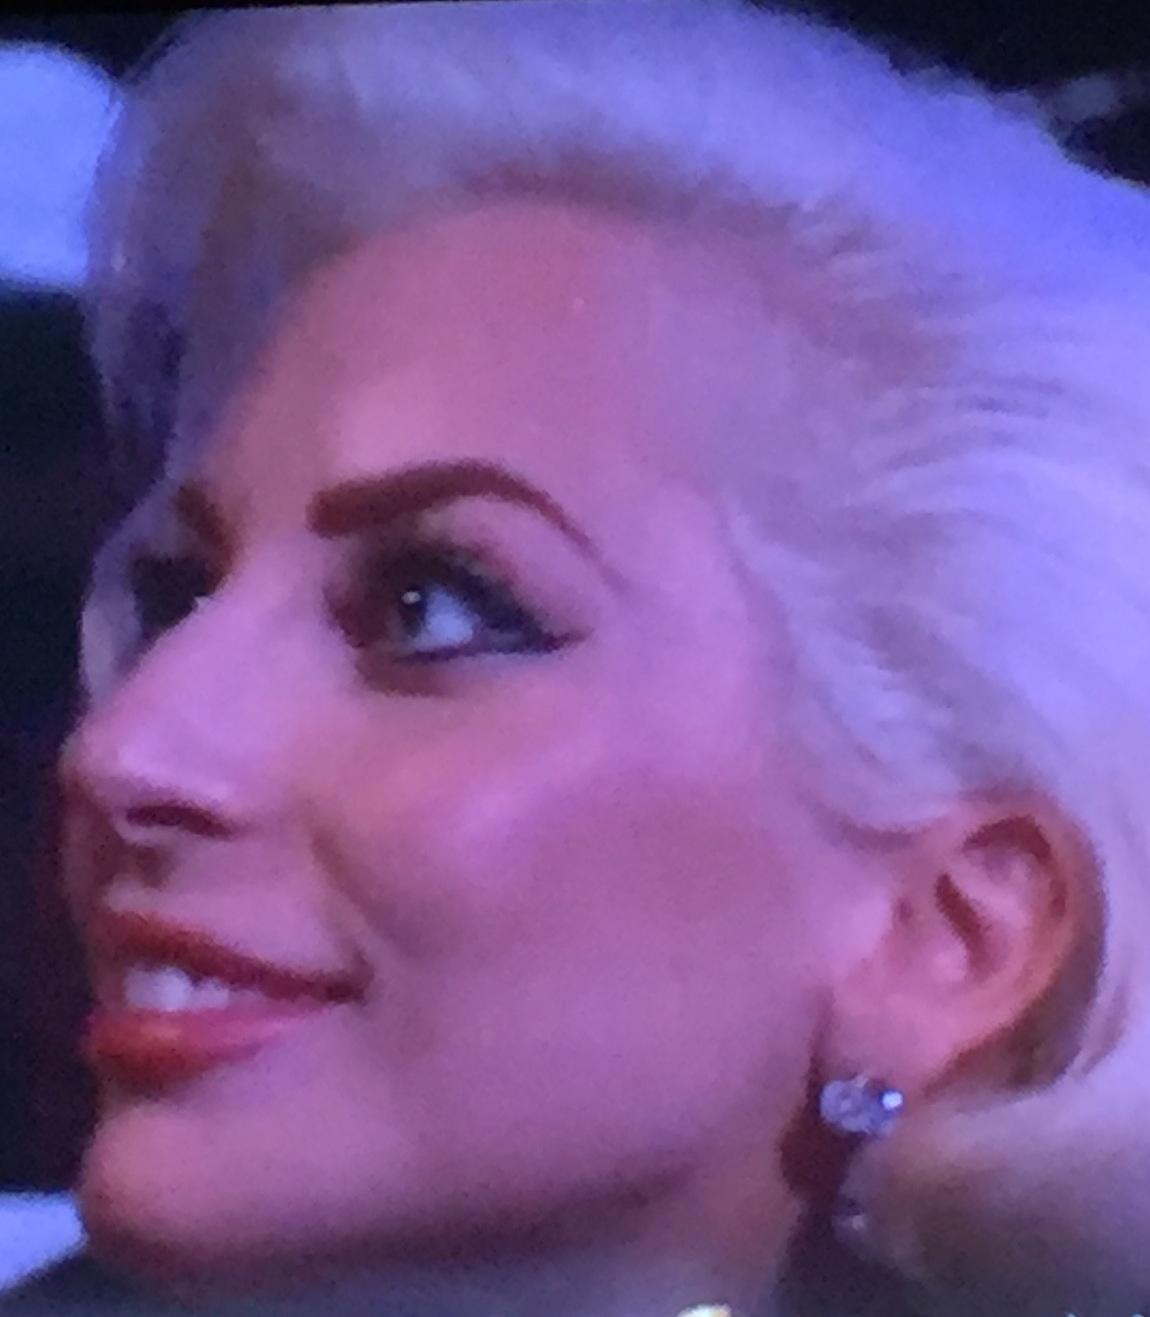 Awards show golden globes 2016 - Lady gaga on est pas couche ...